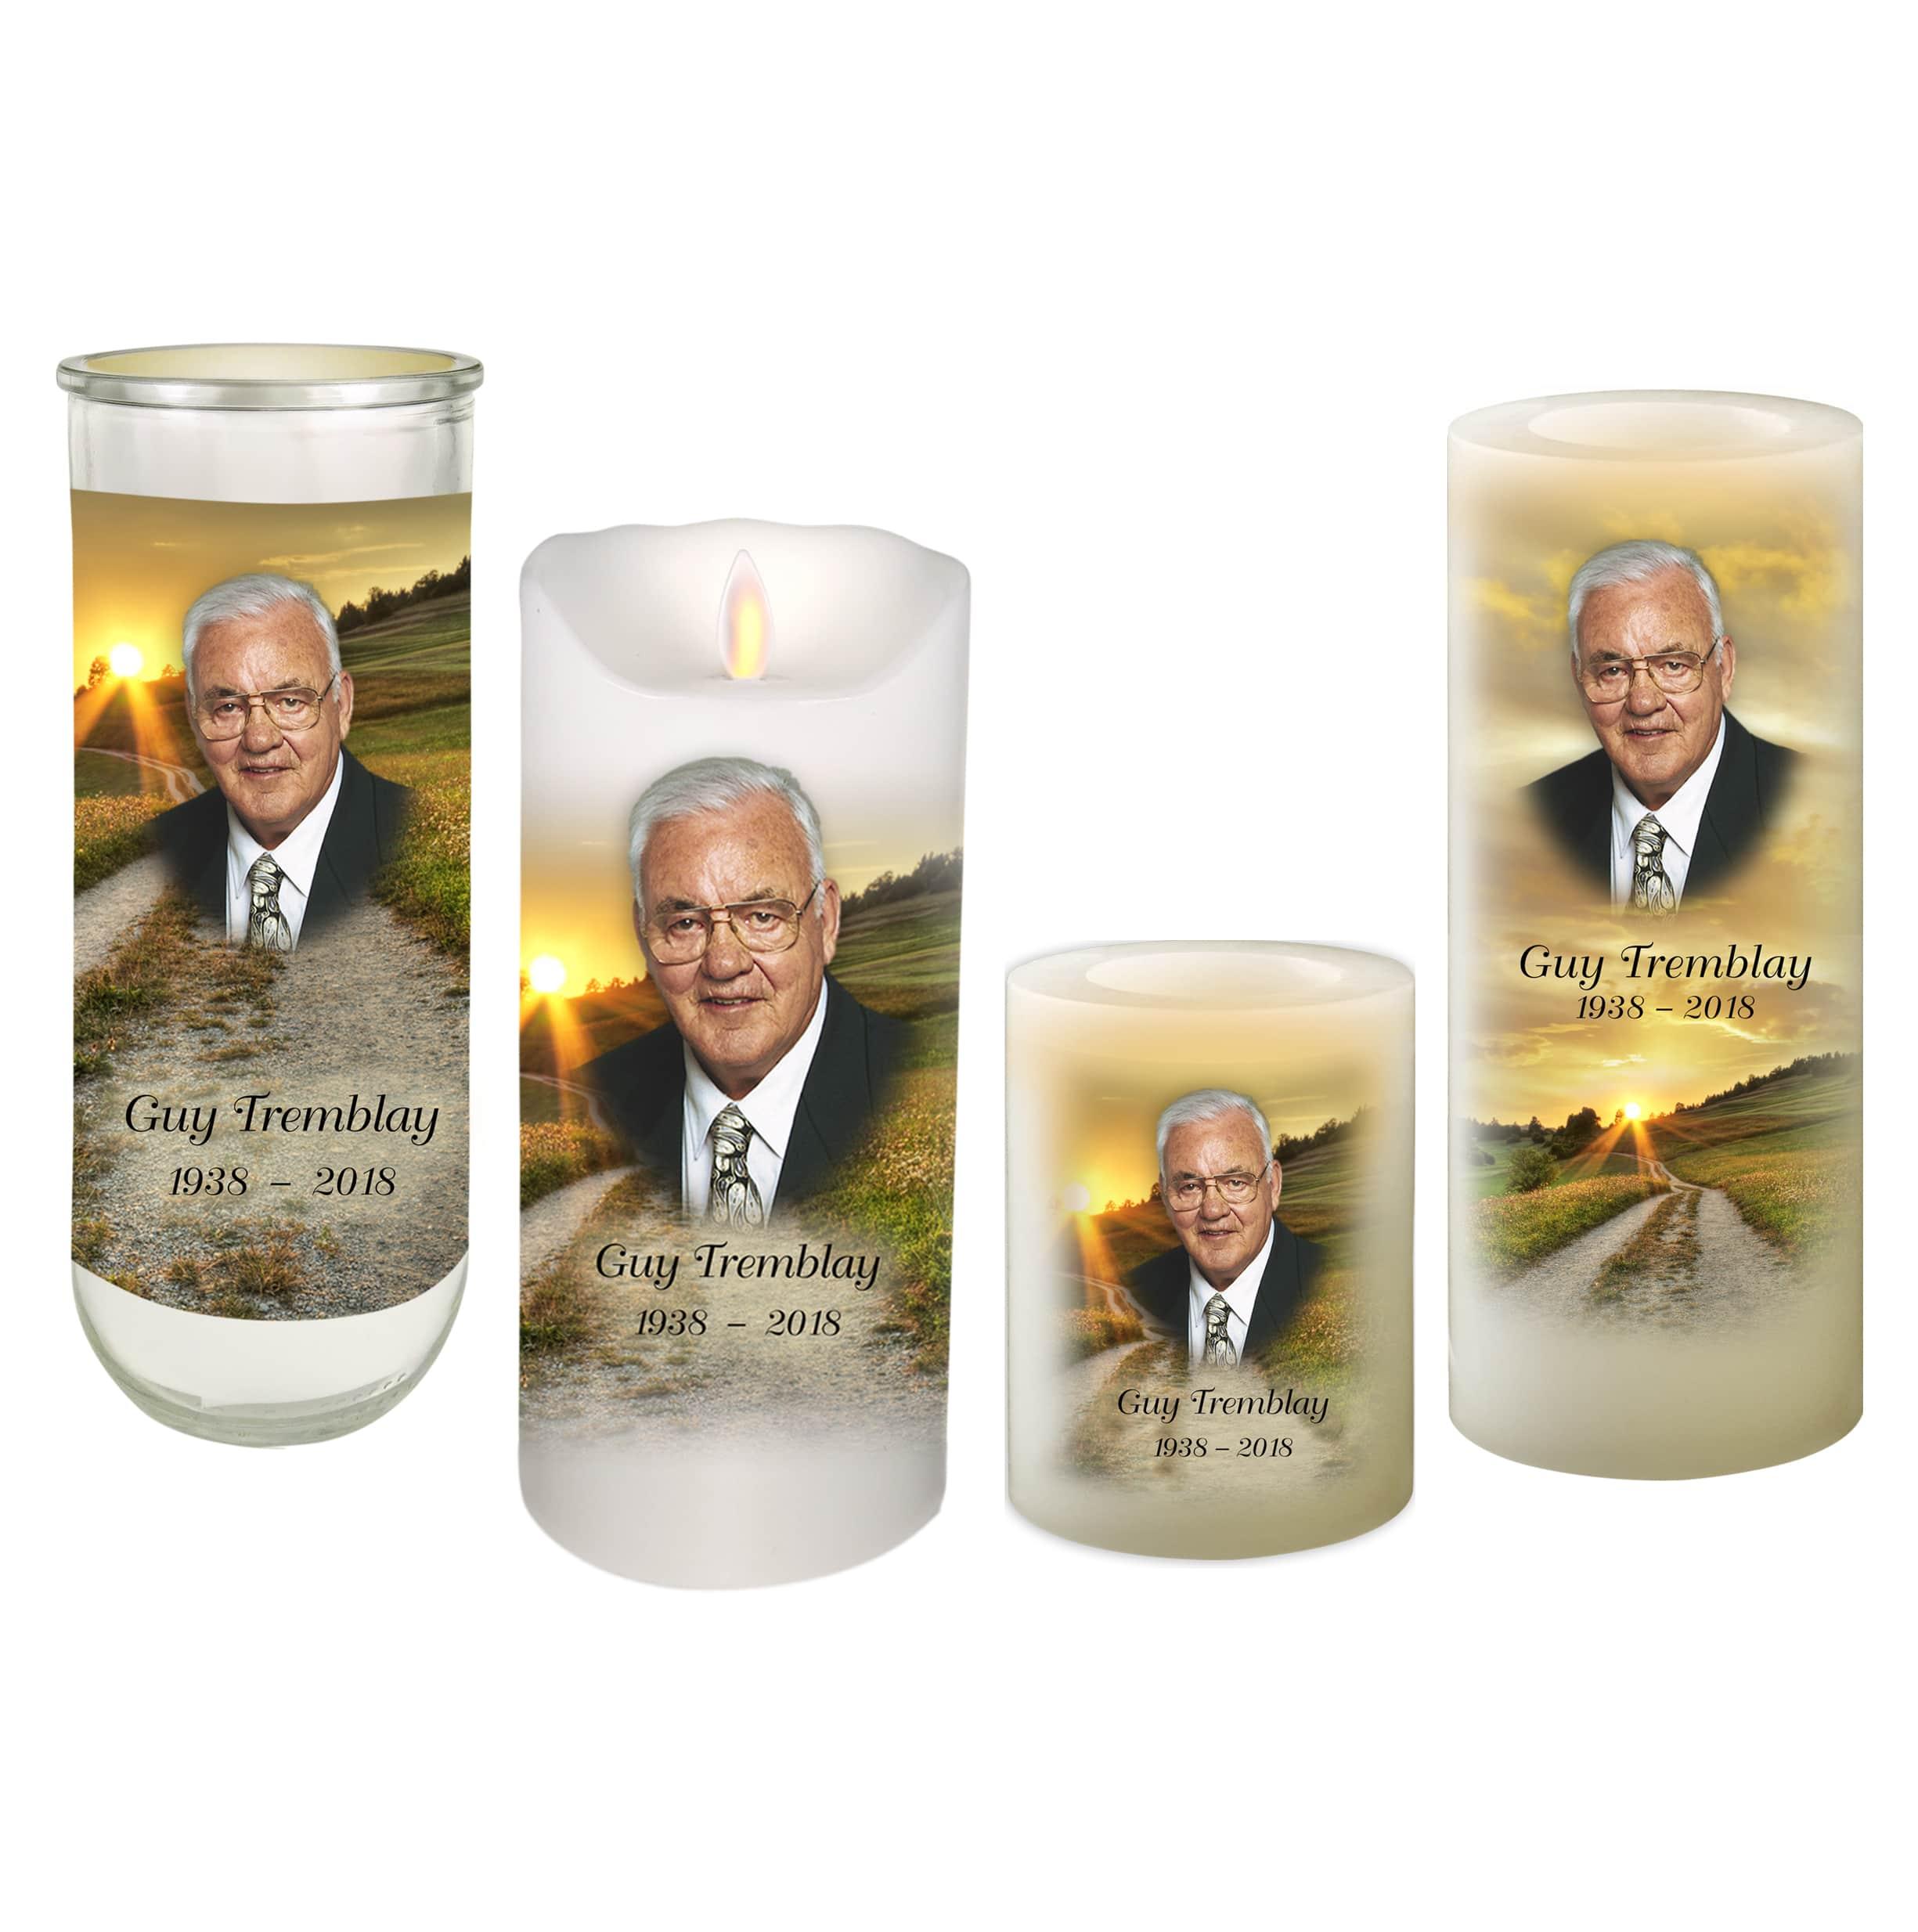 bougies-lampions